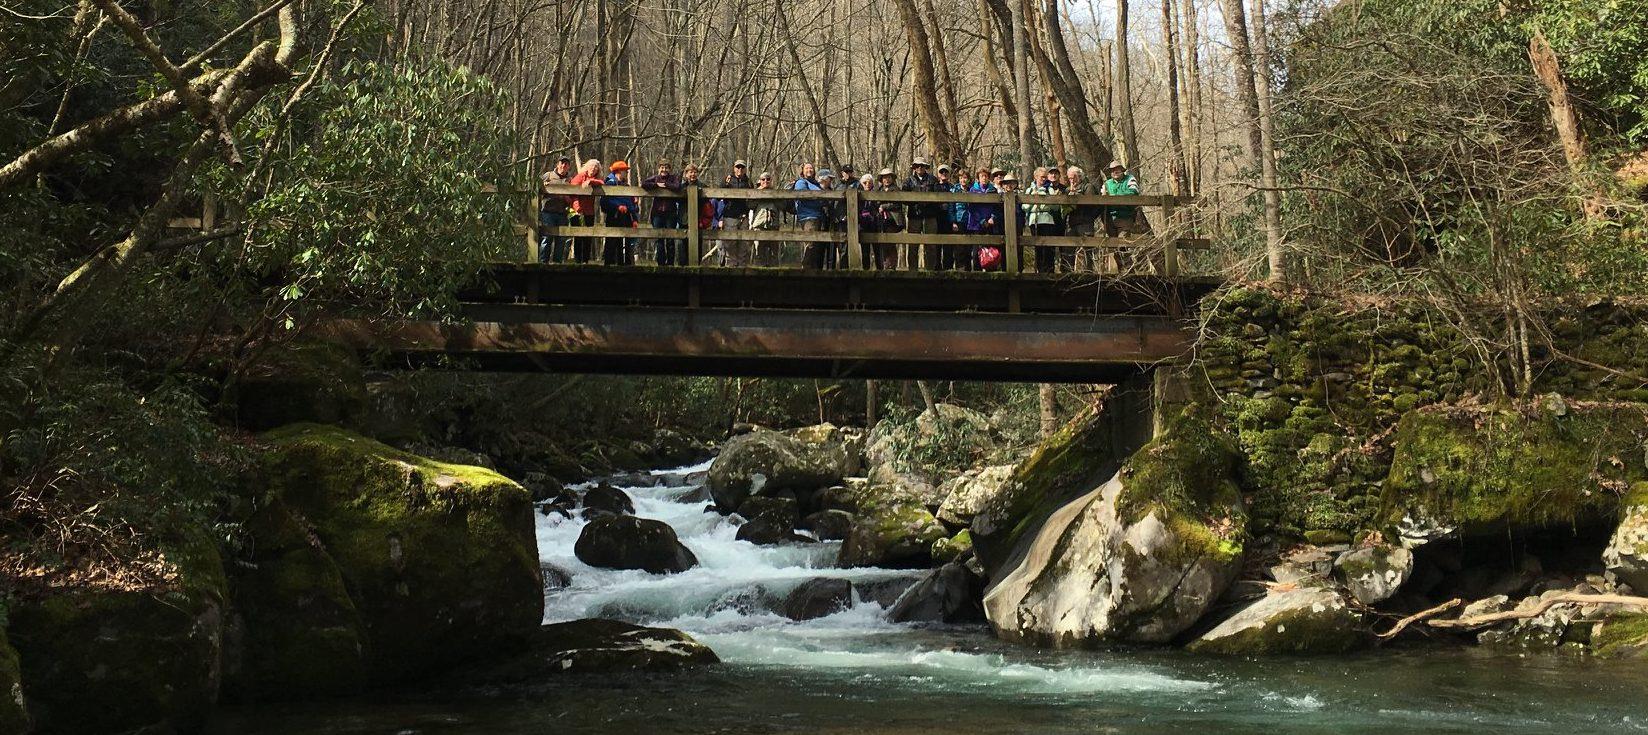 FOTS Big Creek Trail hiking group